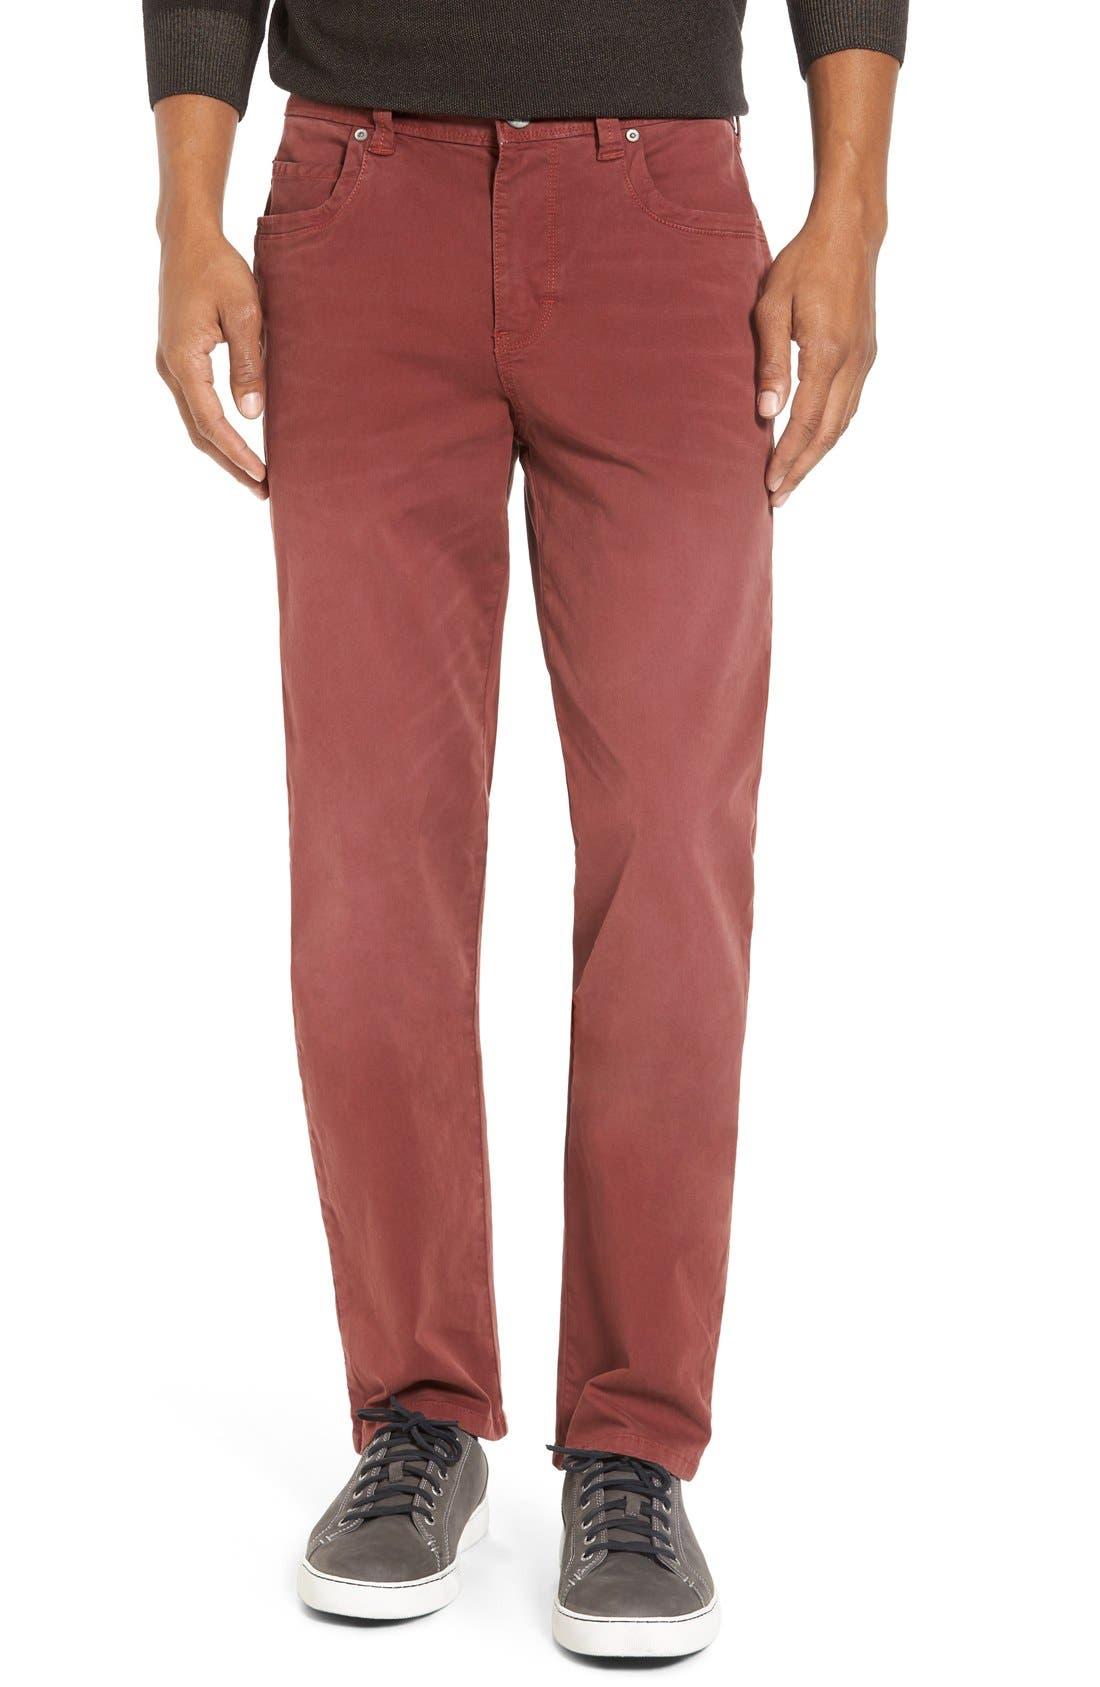 Alternate Image 1 Selected - Tommy Bahama 'Santiago' Washed Twill Pants